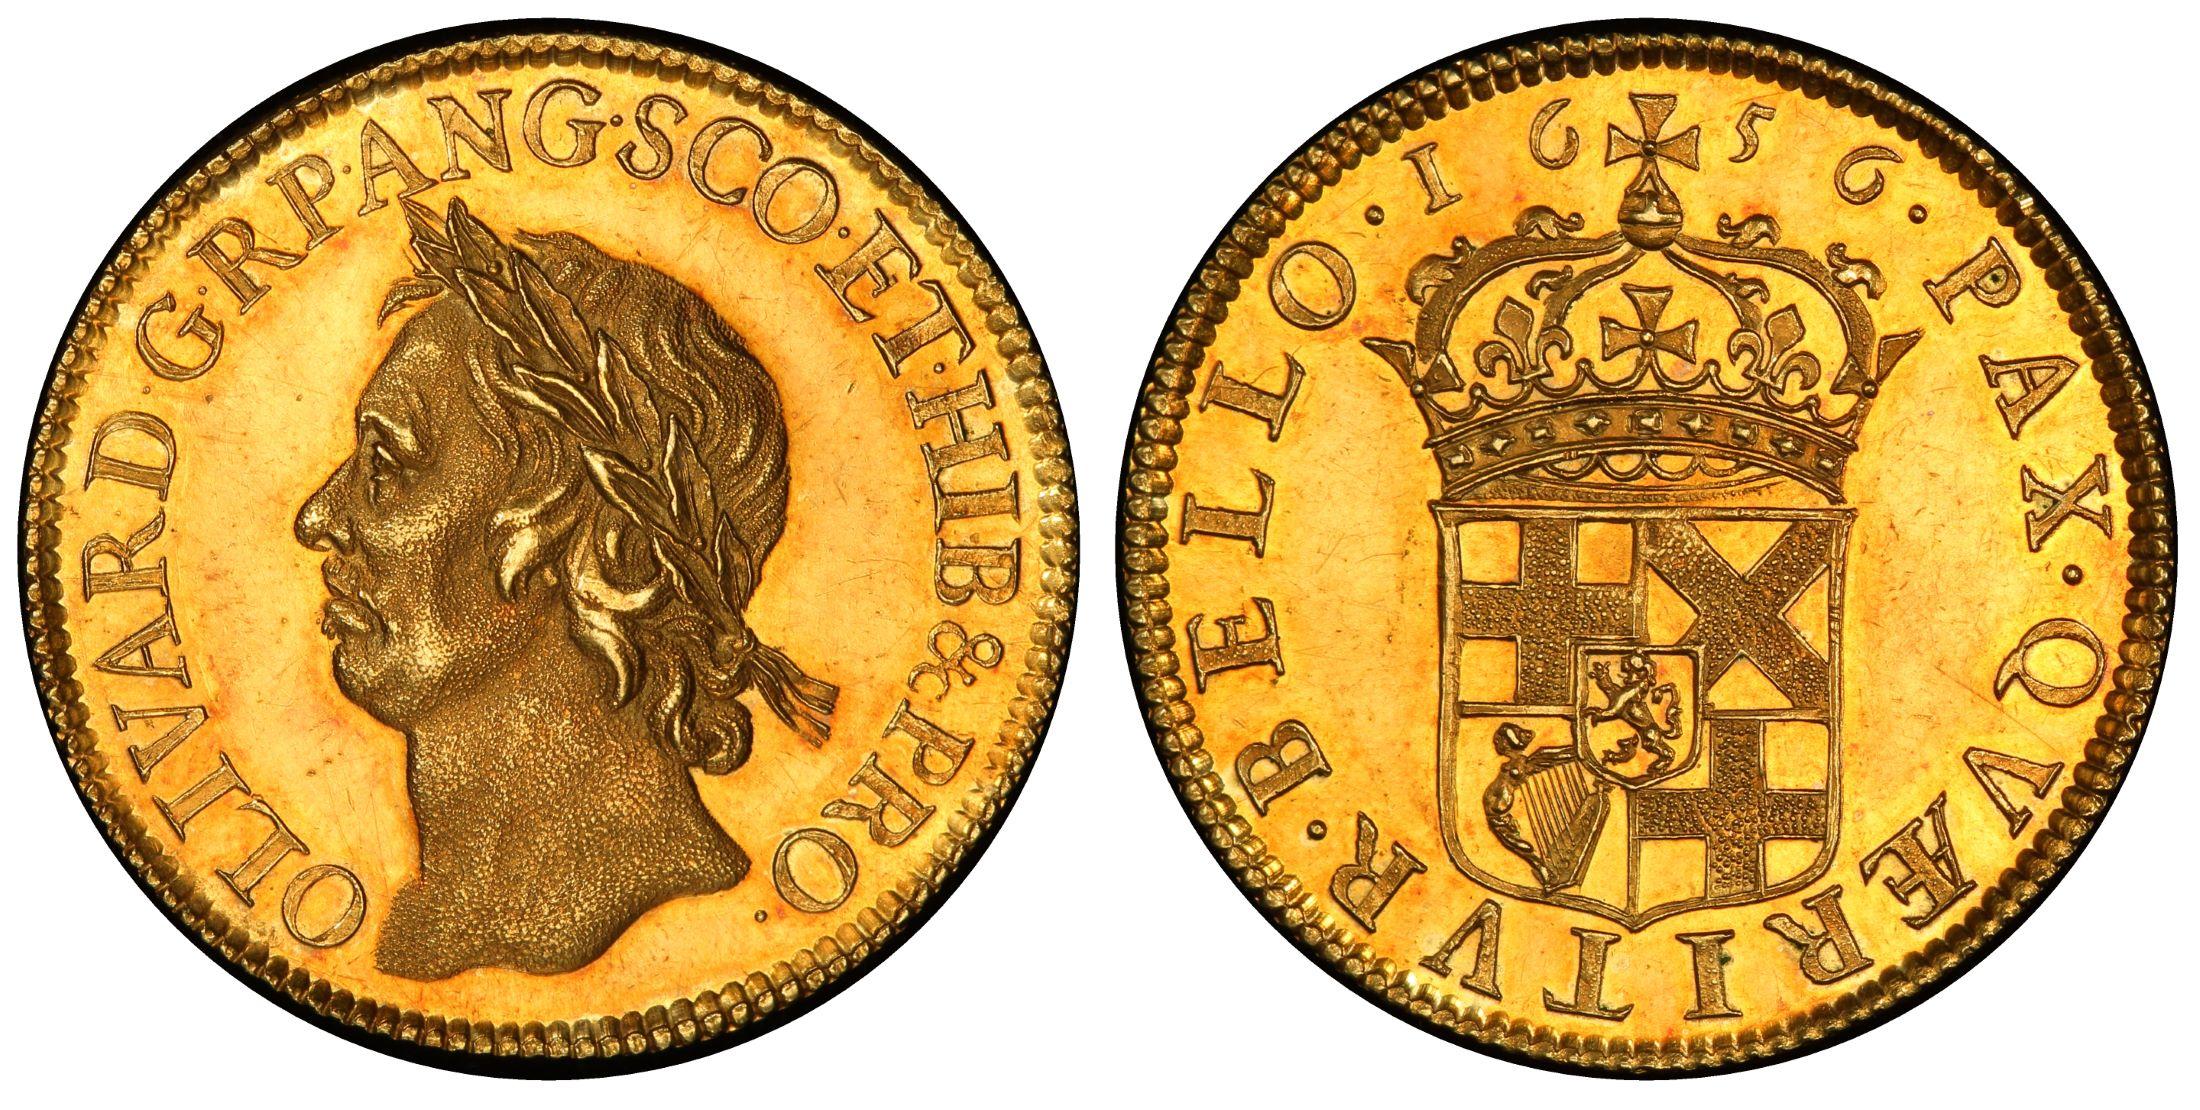 Great Britain 1 Broad, 20 Shillings オリバークロムウェル ブロード試鋳金貨1656年PCGS MS62